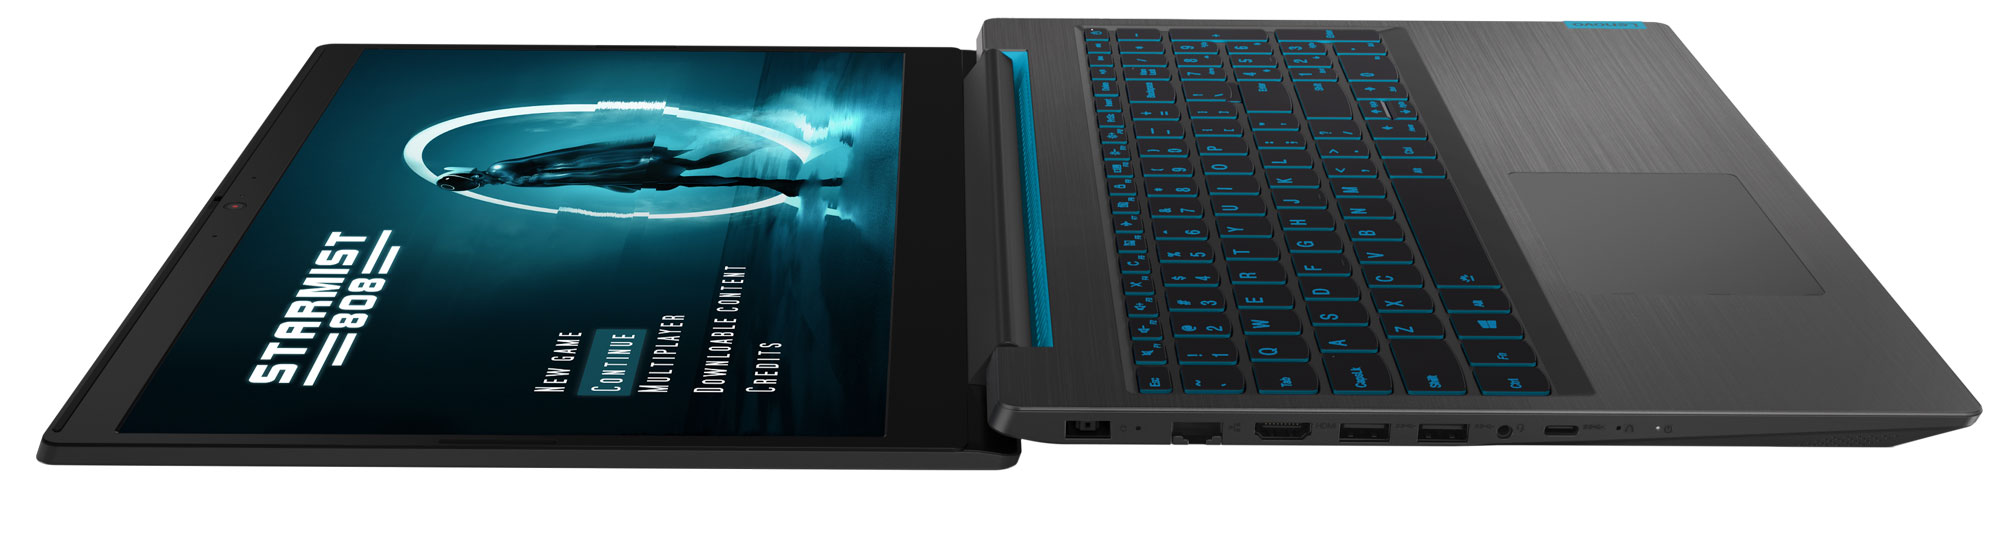 Фото  Ноутбук Lenovo ideapad L340-15IRH Gaming Black (81LK00TWRE)